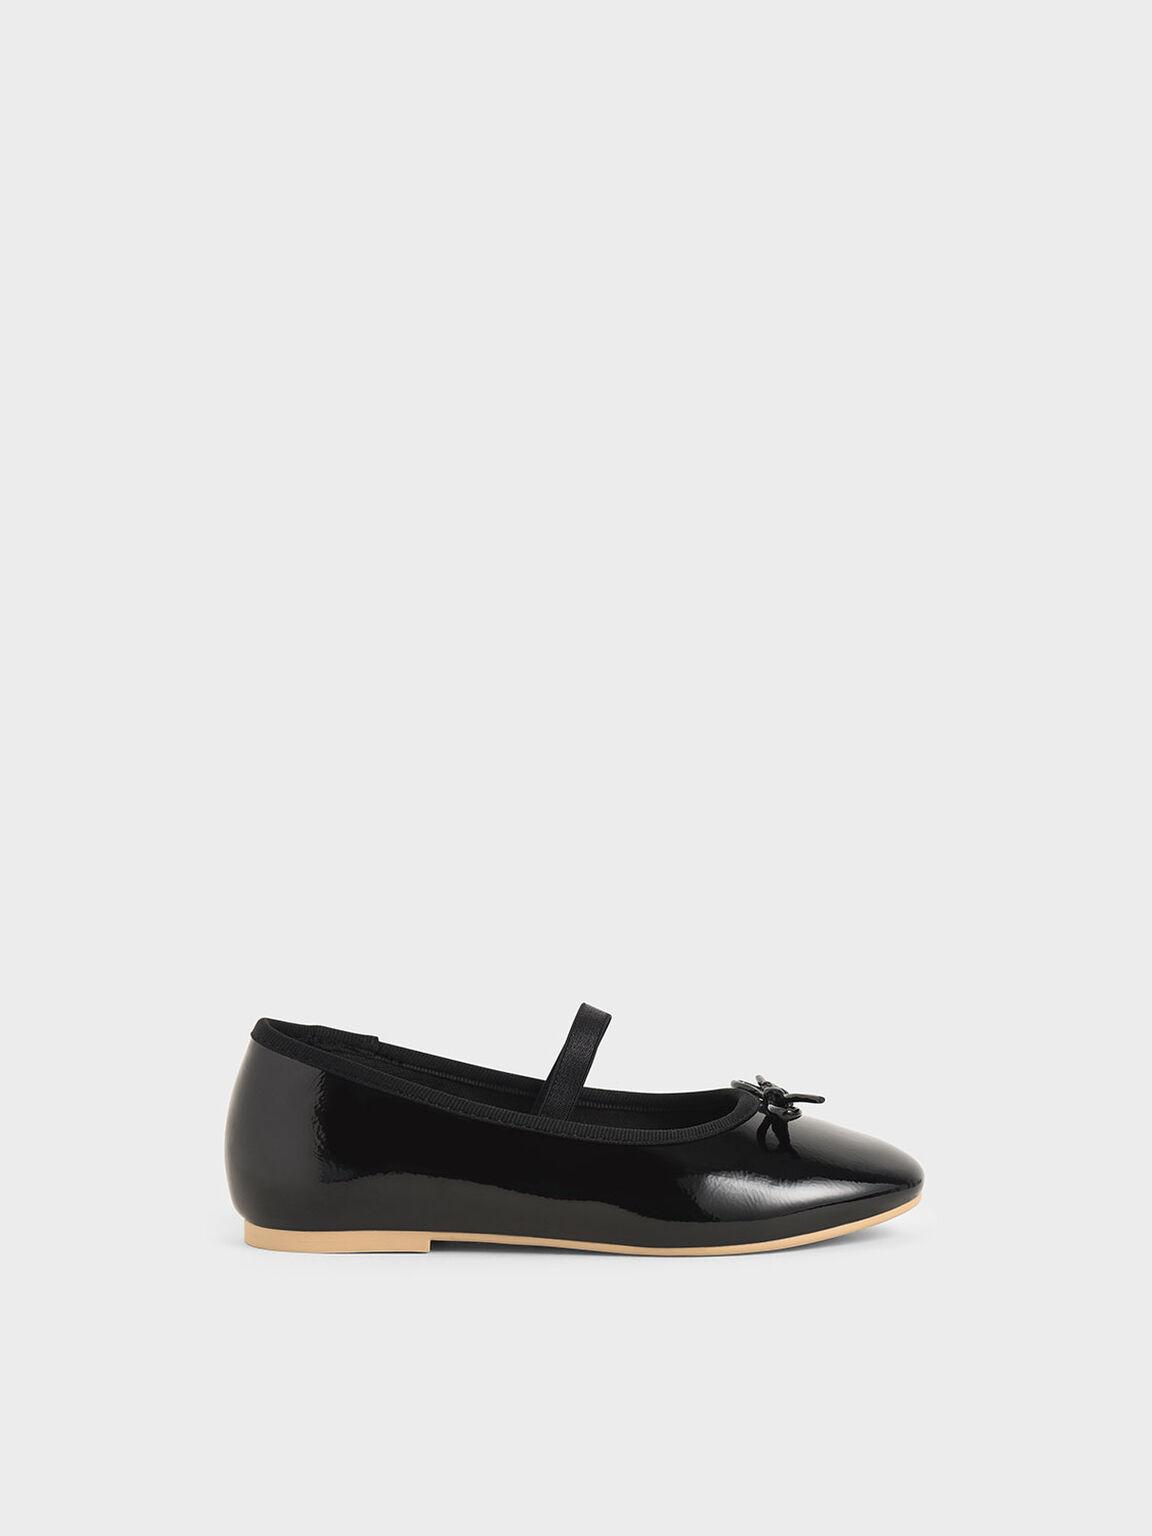 Girls' Patent Bow Ballerina Flats, Black, hi-res